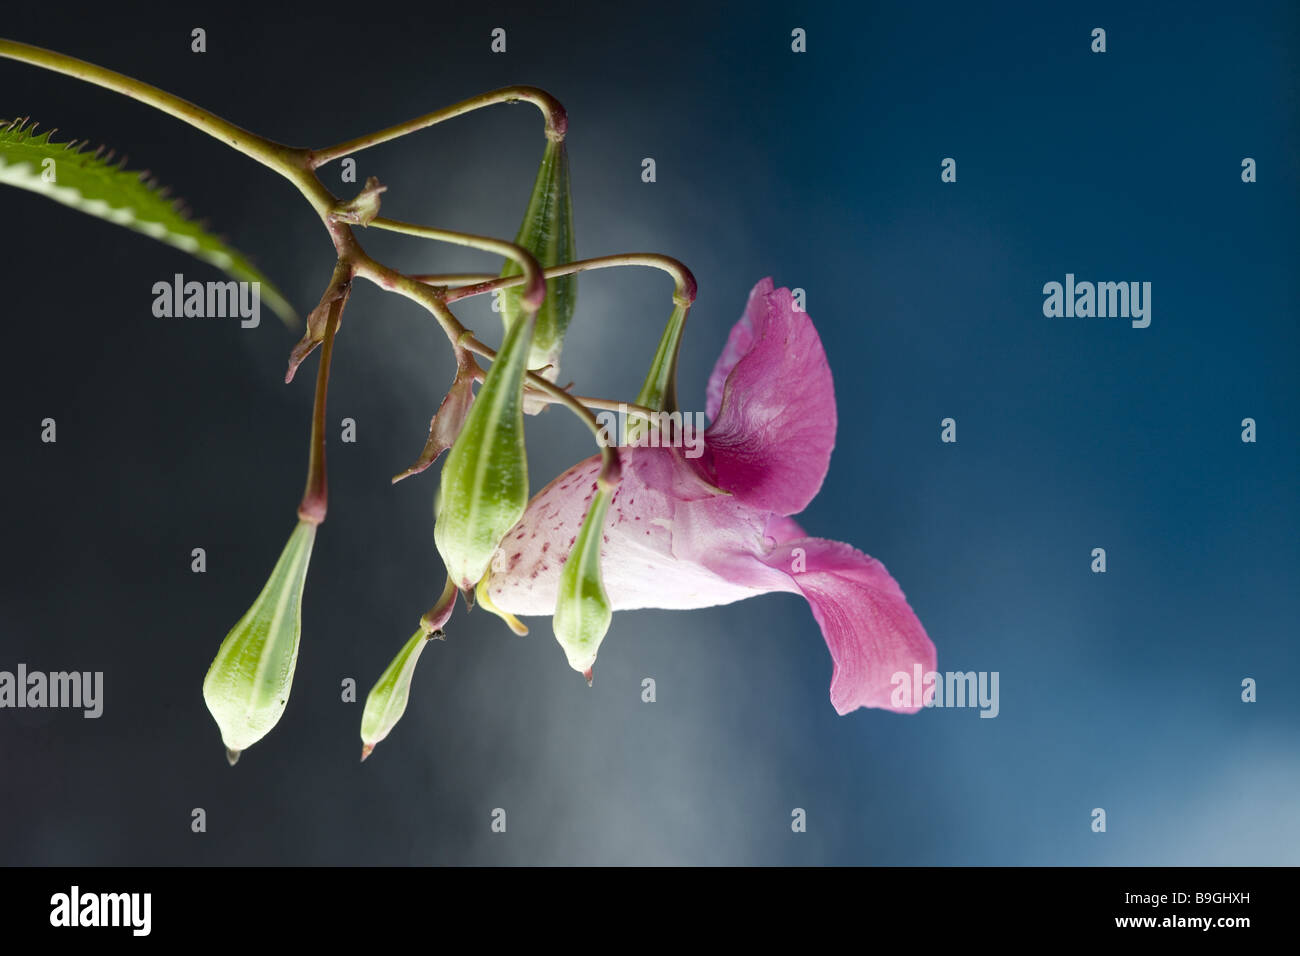 Indian touch-me-not Impatiens glandulifera detail blooming seed capsules  emscherorchidee' garden-plants alternative Stock Photo